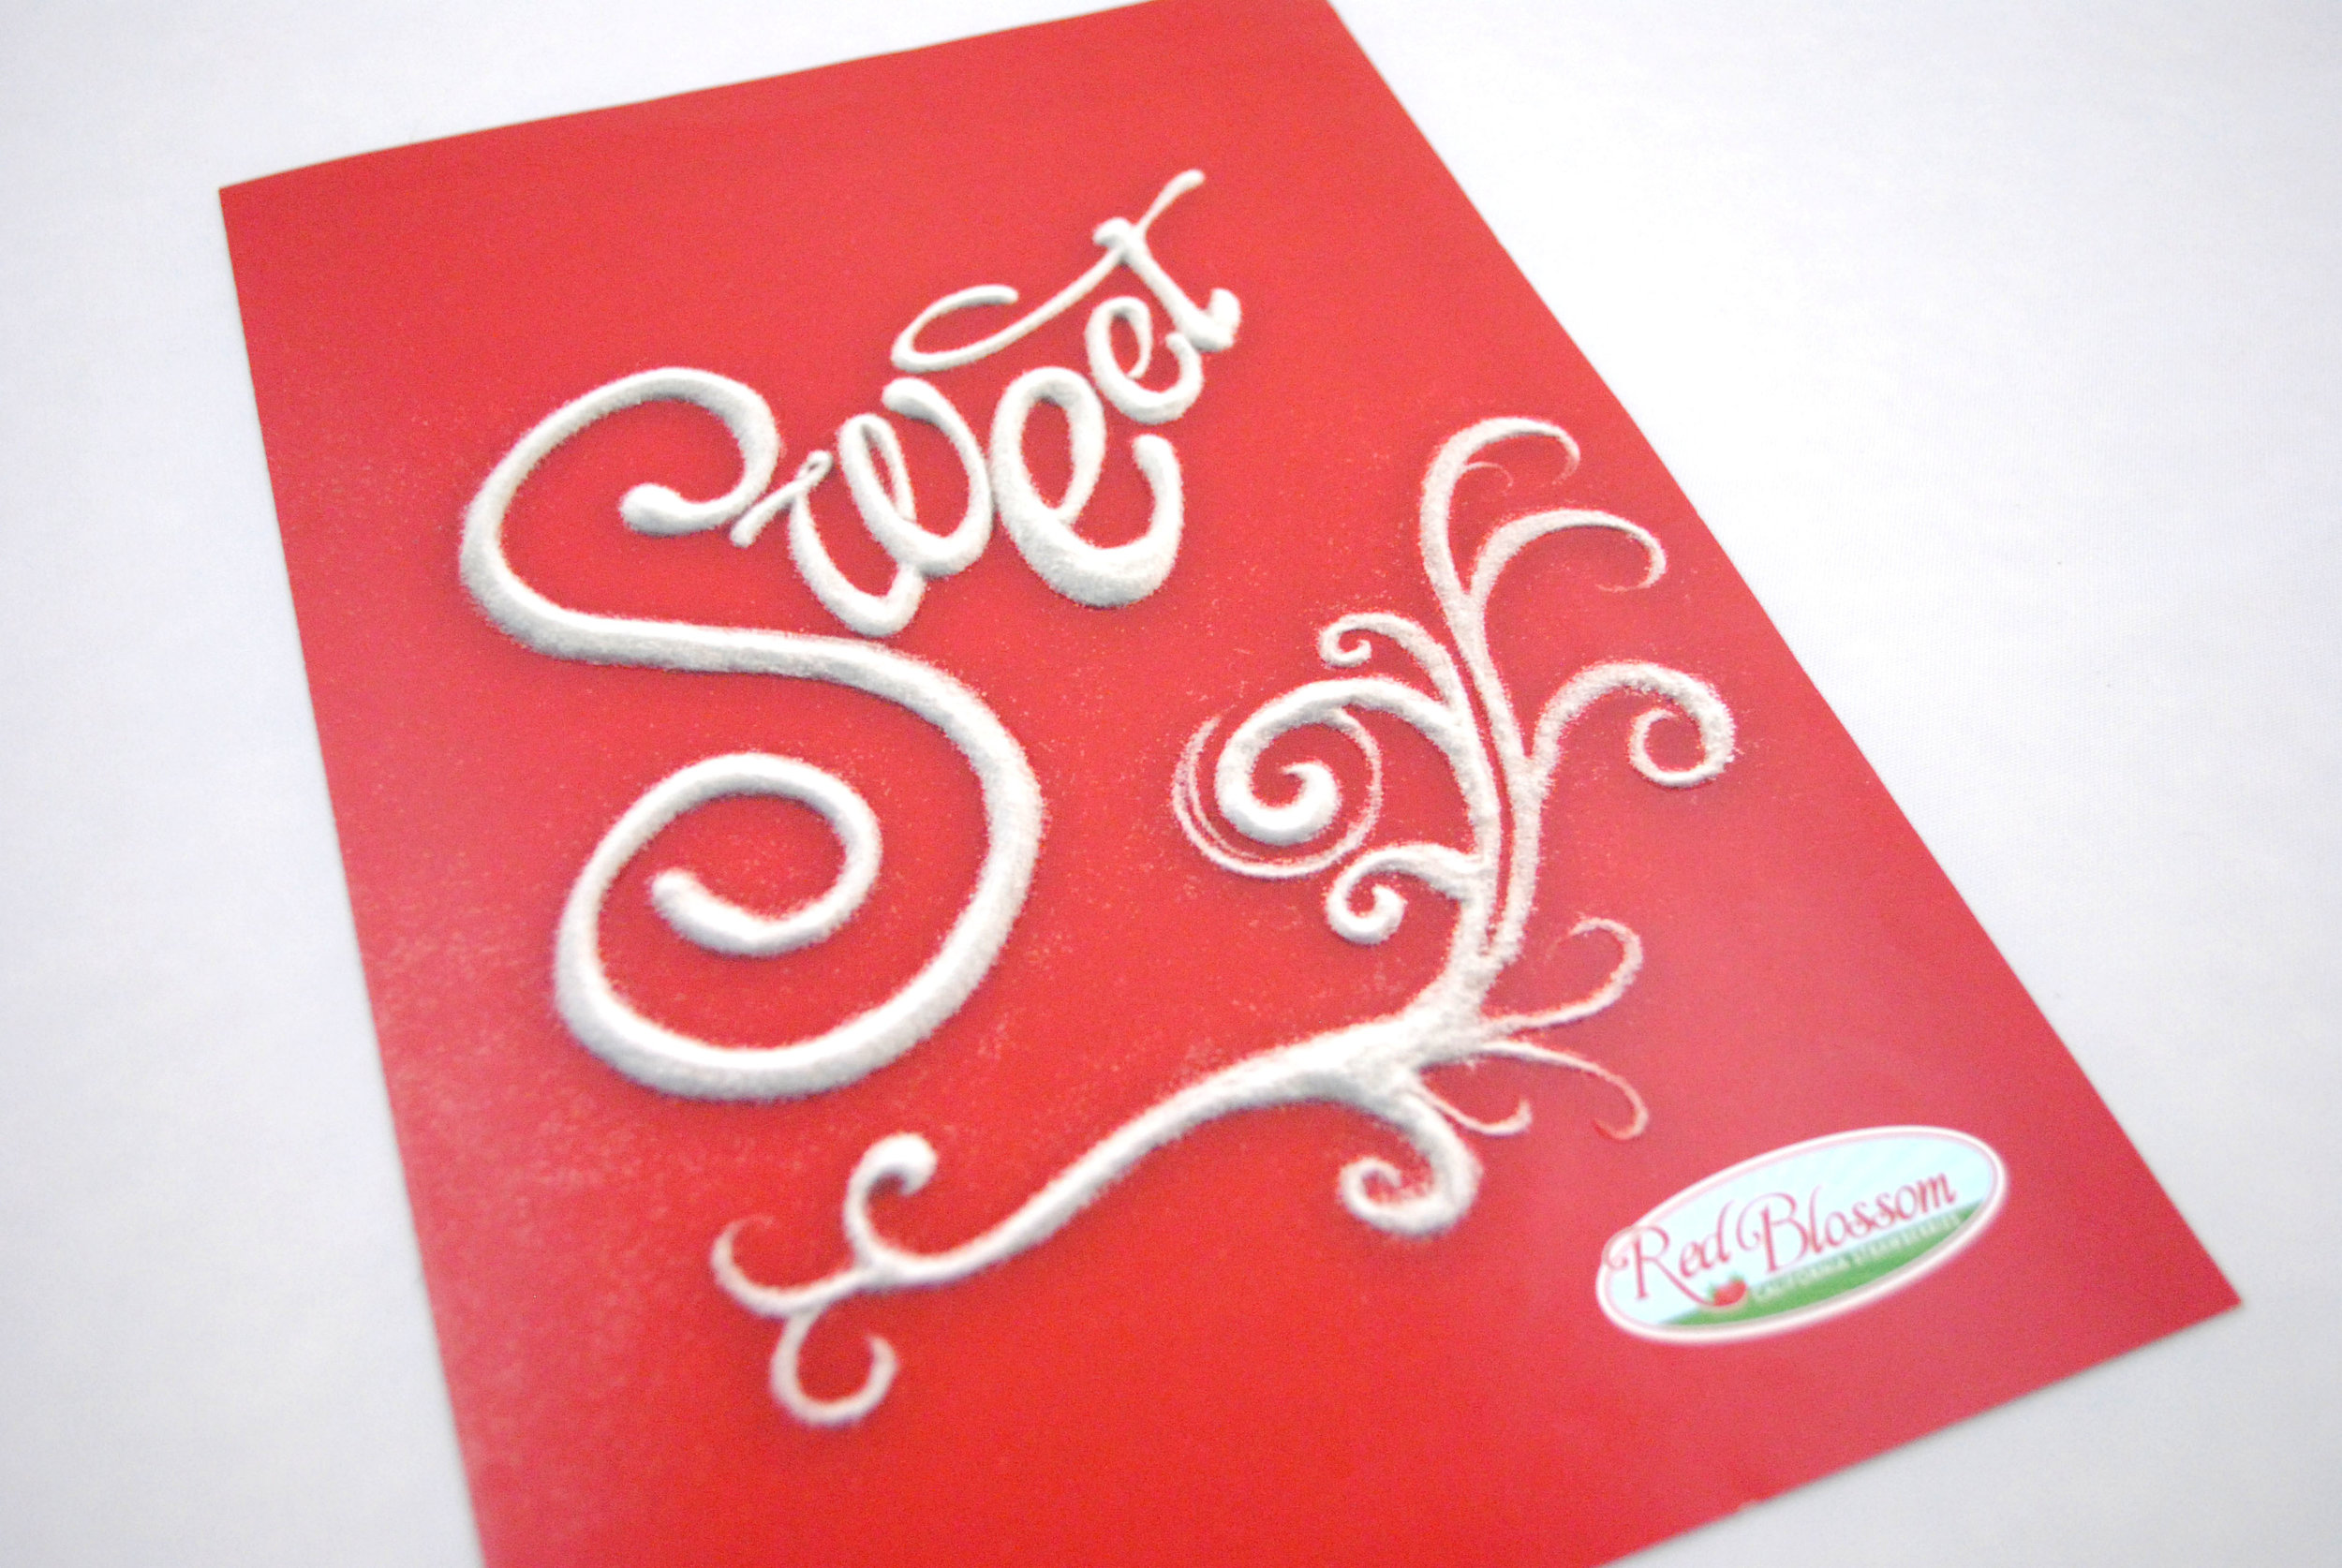 red-blossom-sweet-advertisment.jpg